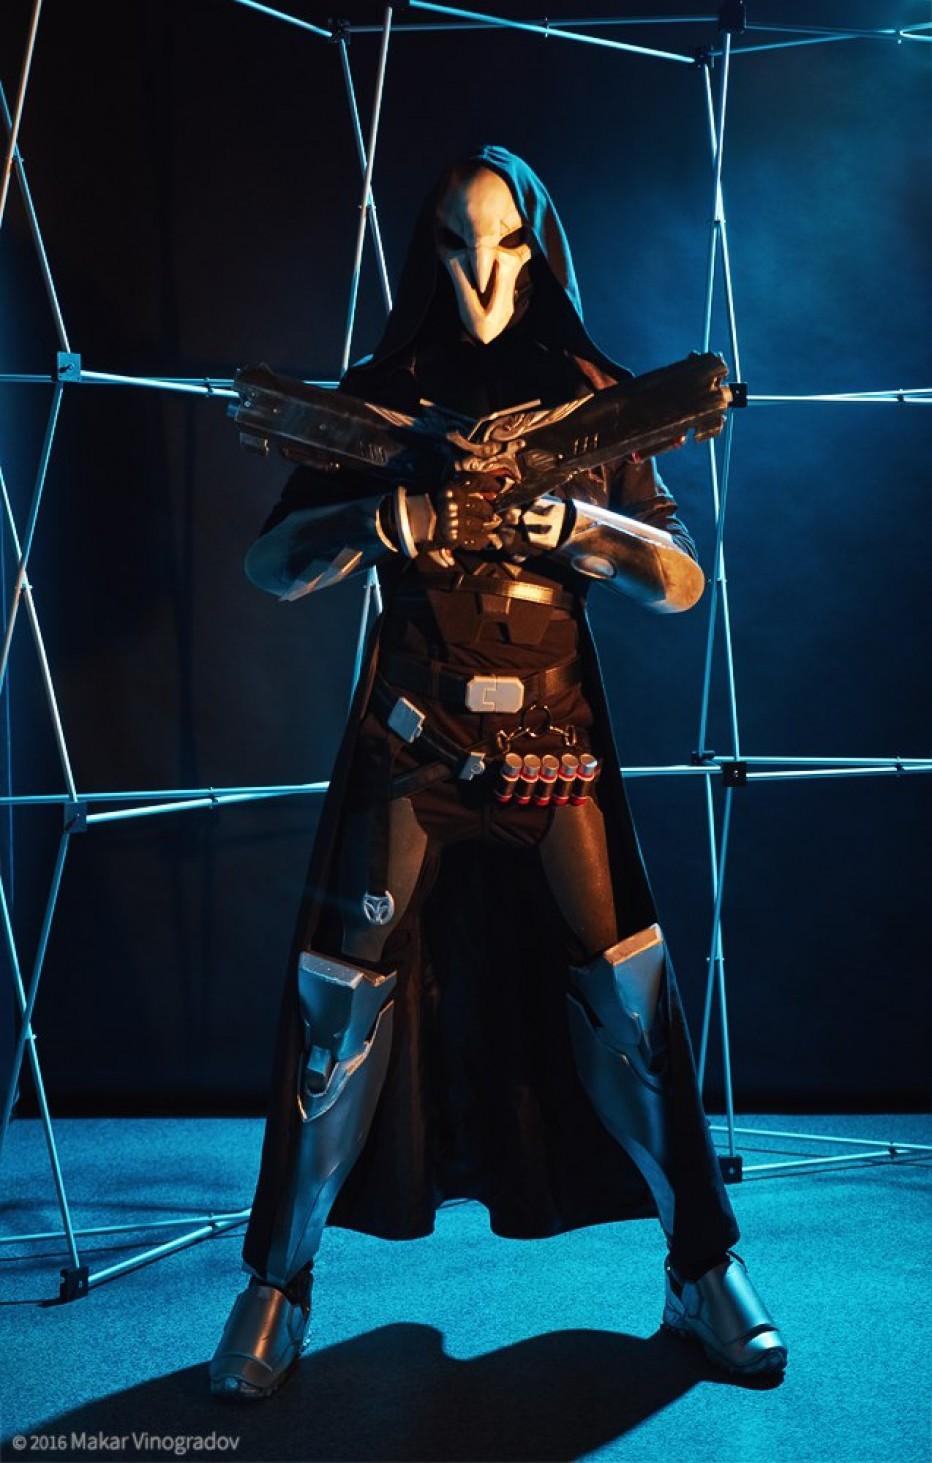 cosplay wednesday overwatch s reaper gamersheroes